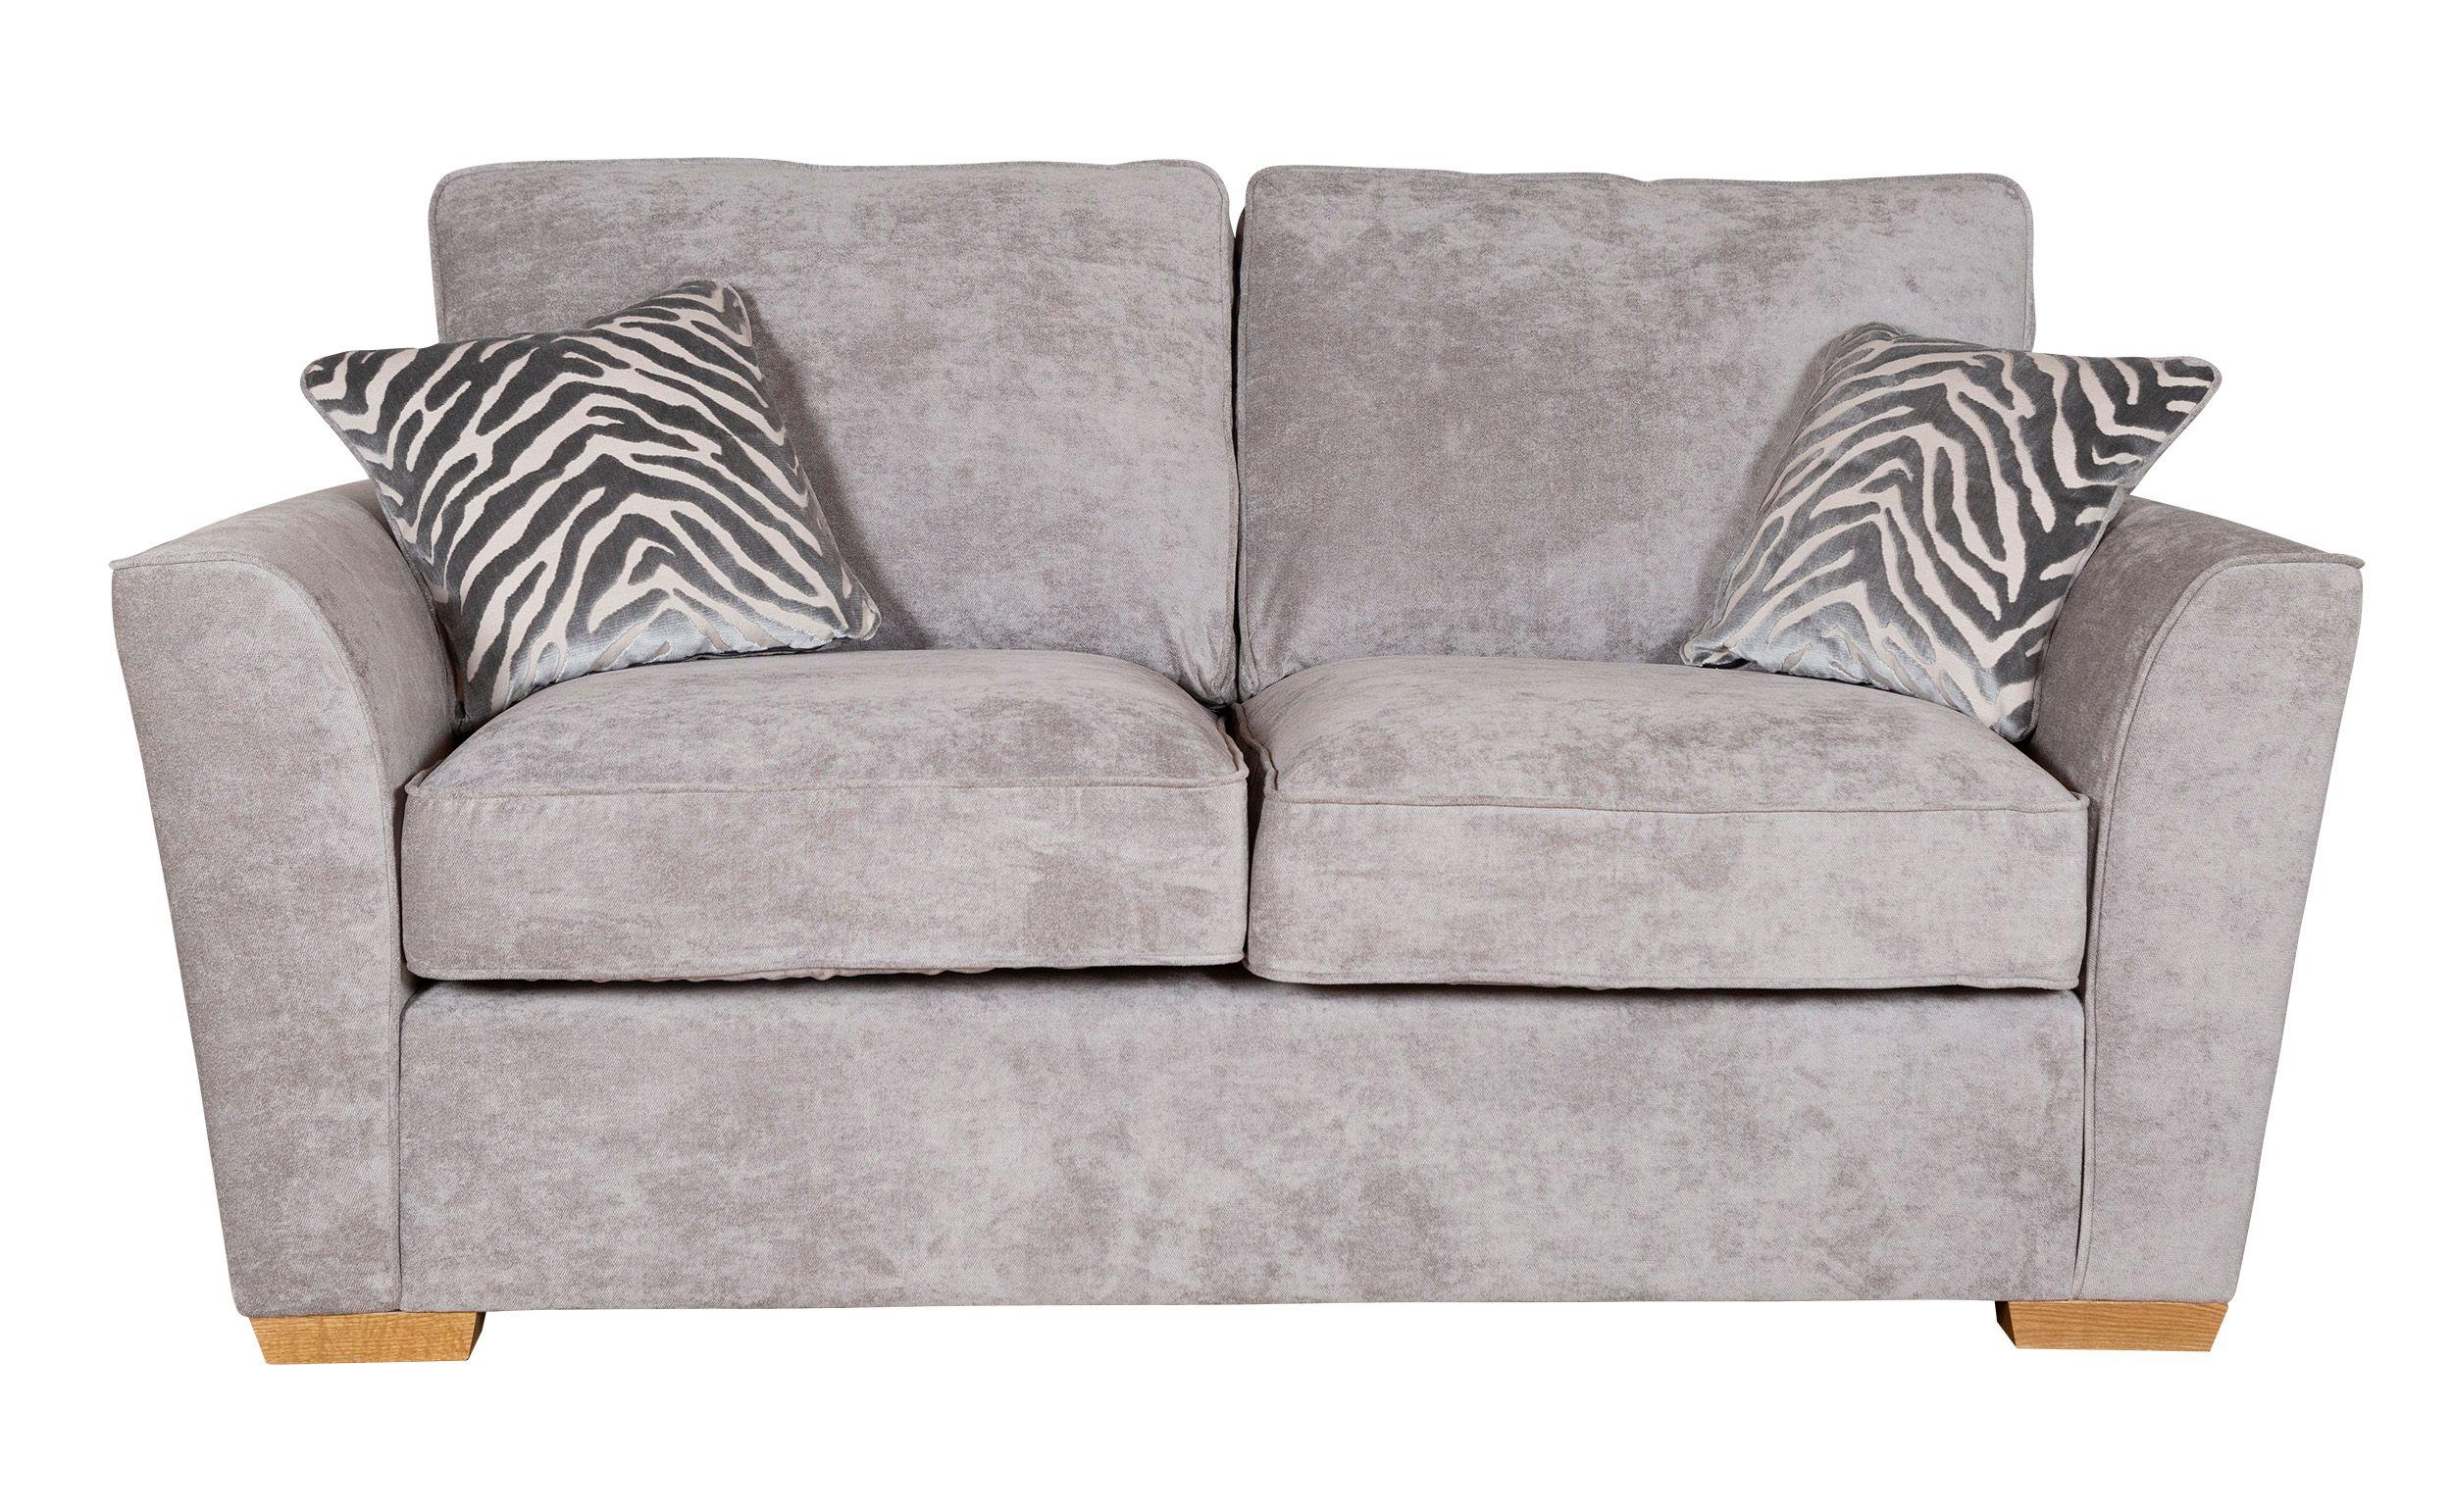 Fantasy 2 Seater Sofa - Standard Back